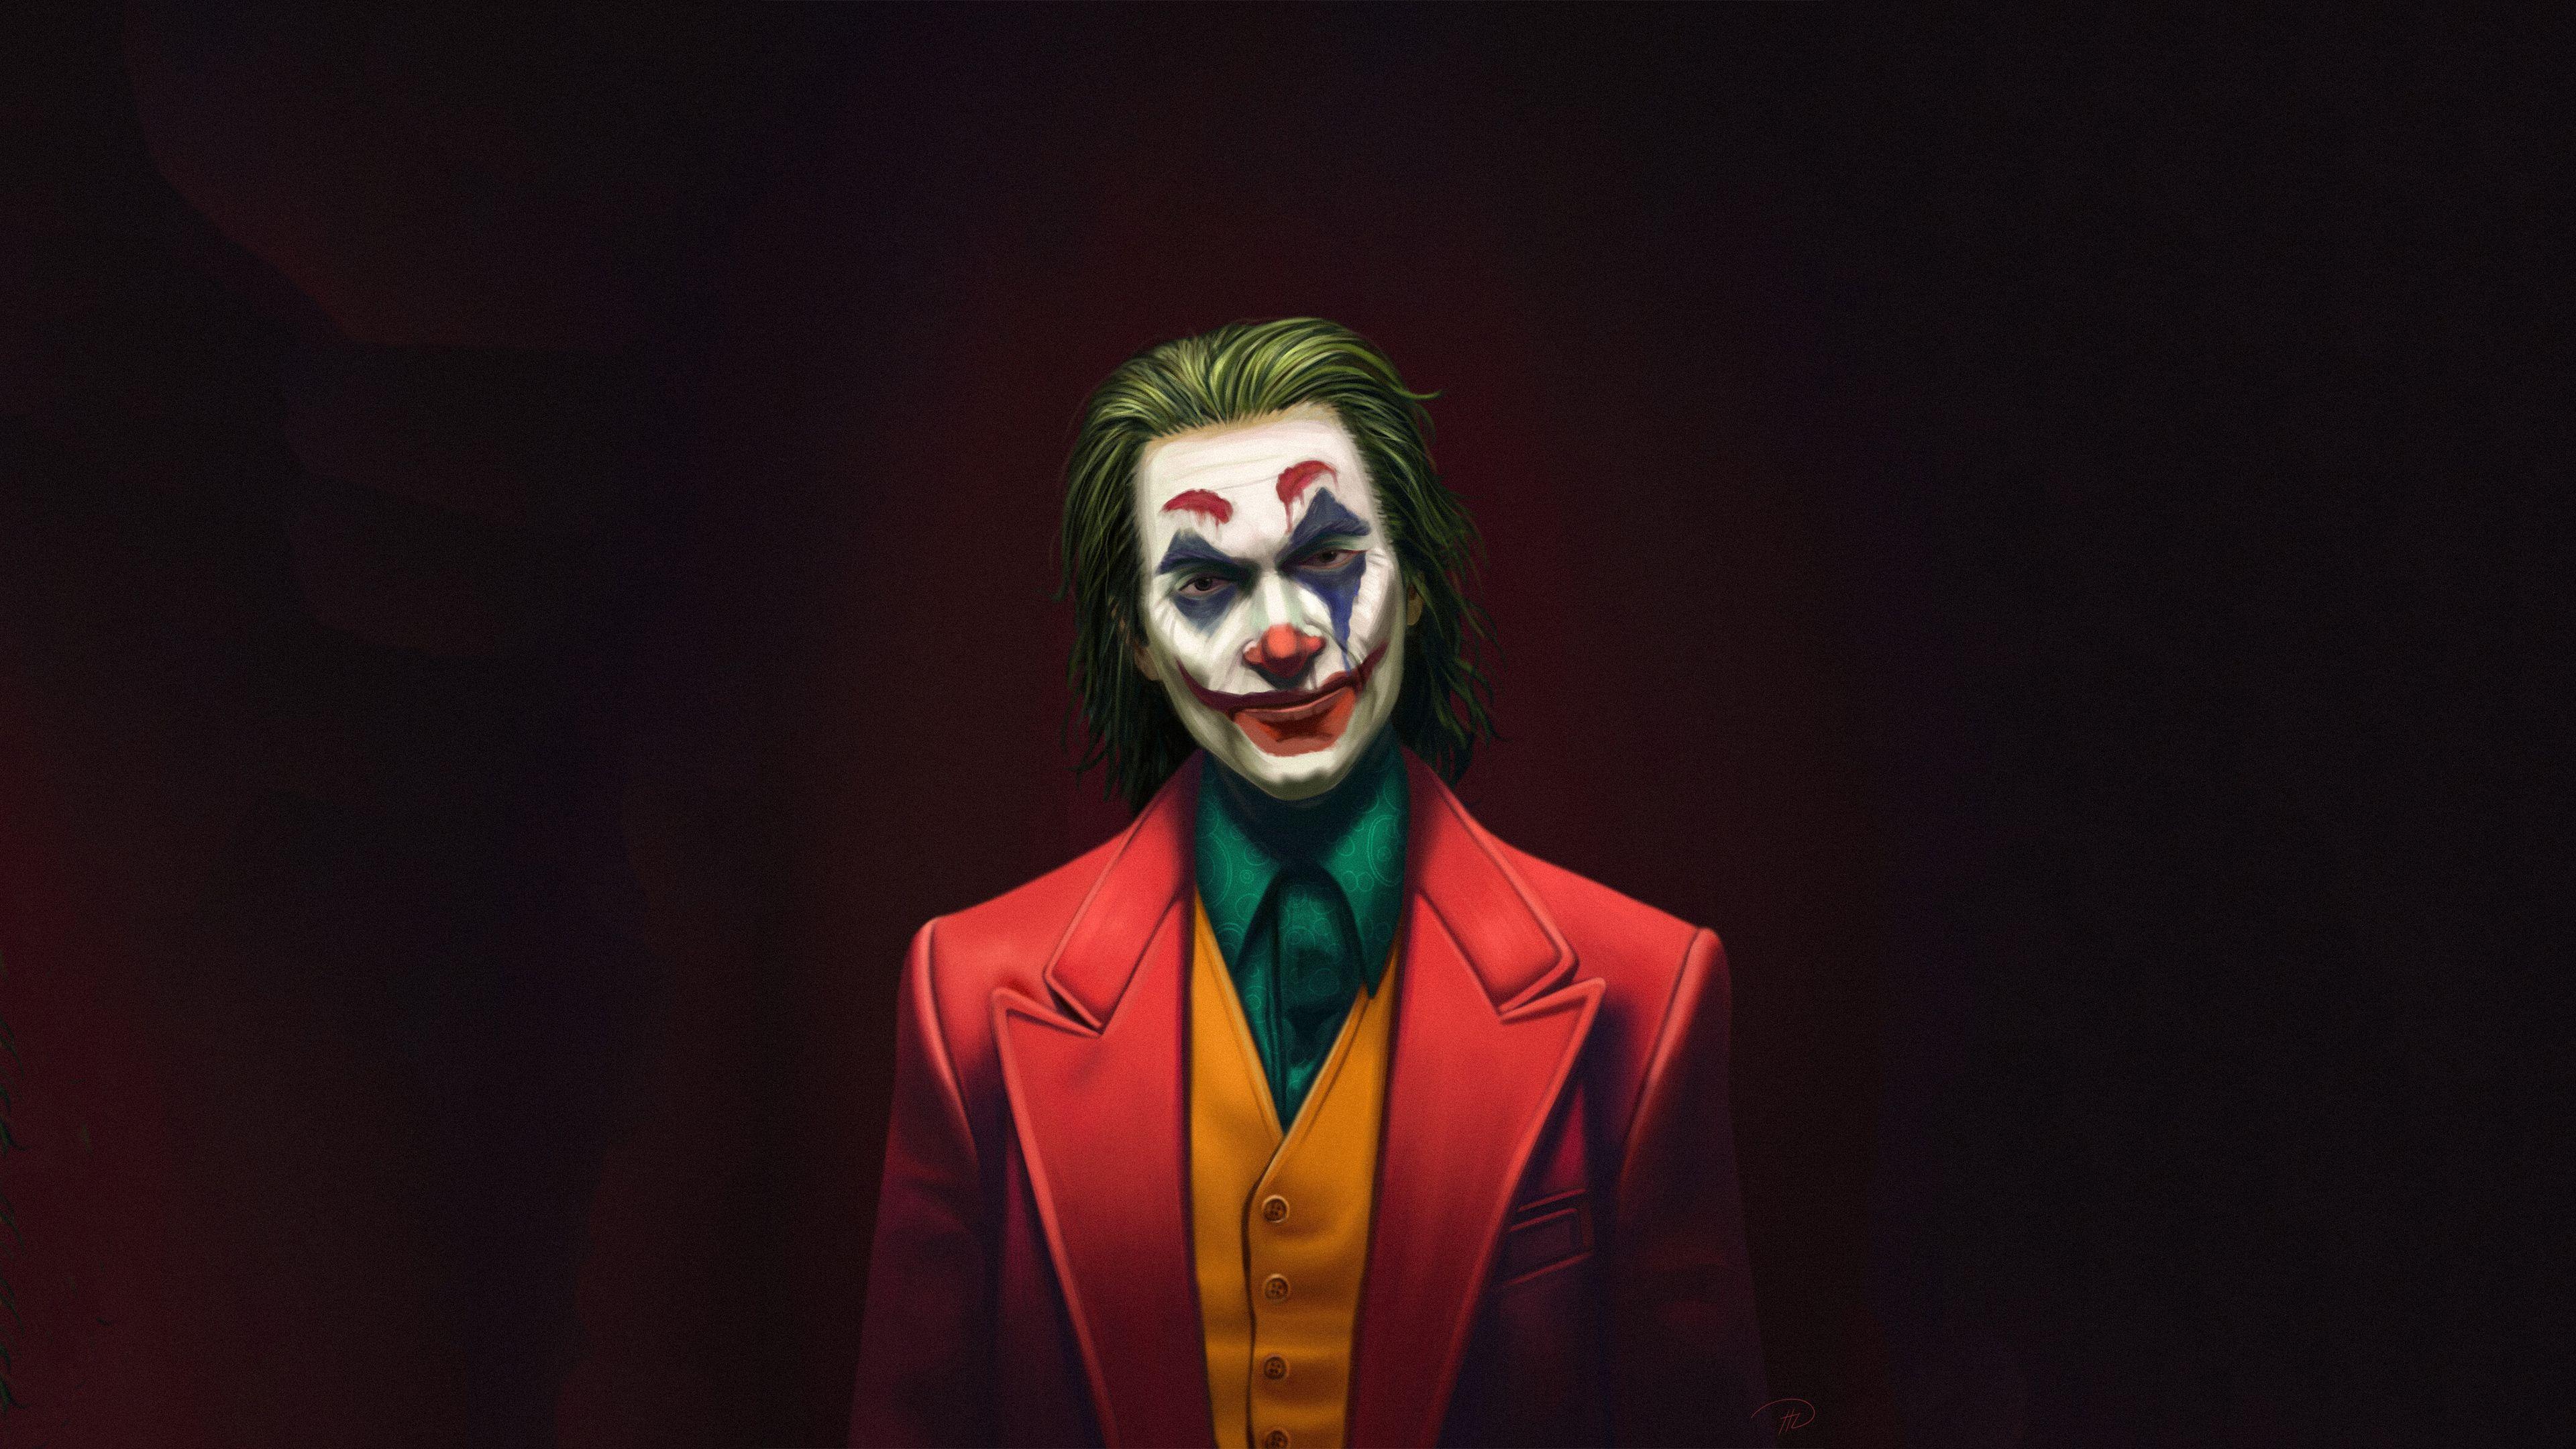 Joker Movie Joaquin Phoenix Art Supervillain Wallpapers Superheroes Wallpapers Joker Wallpapers Joker M In 2020 Joker Wallpapers Joker Hd Wallpaper Batman Wallpaper